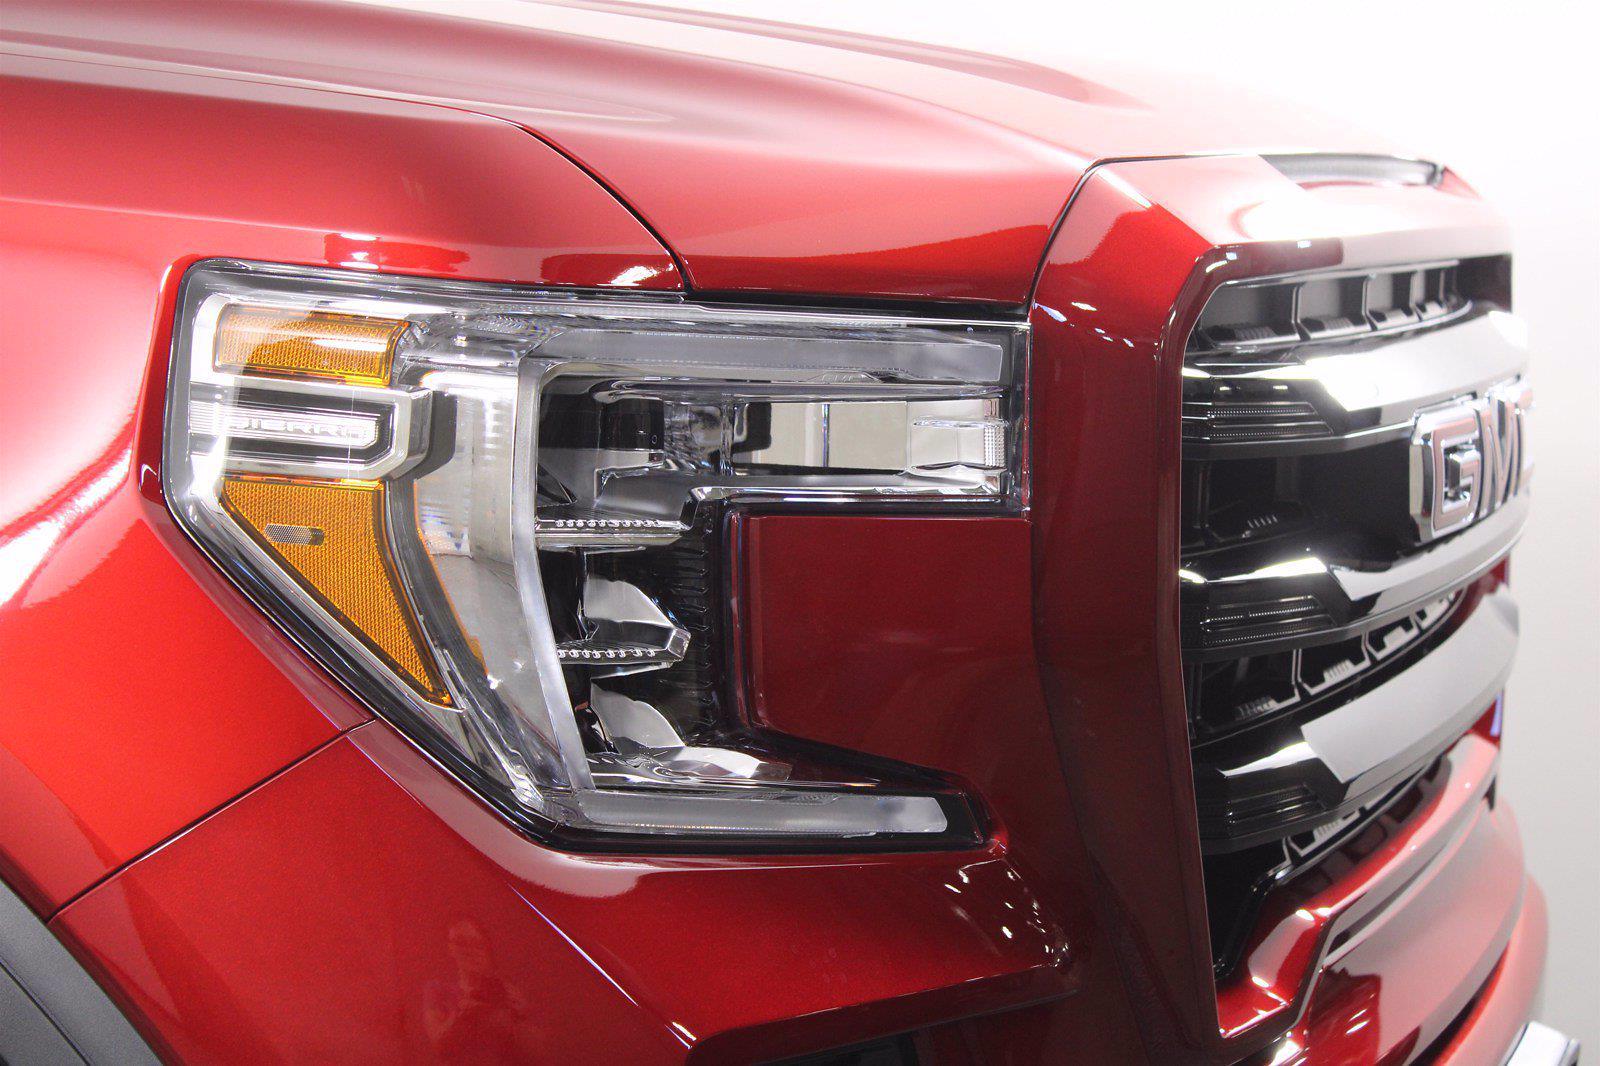 2021 GMC Sierra 1500 Crew Cab 4x4, Pickup #D411004 - photo 5